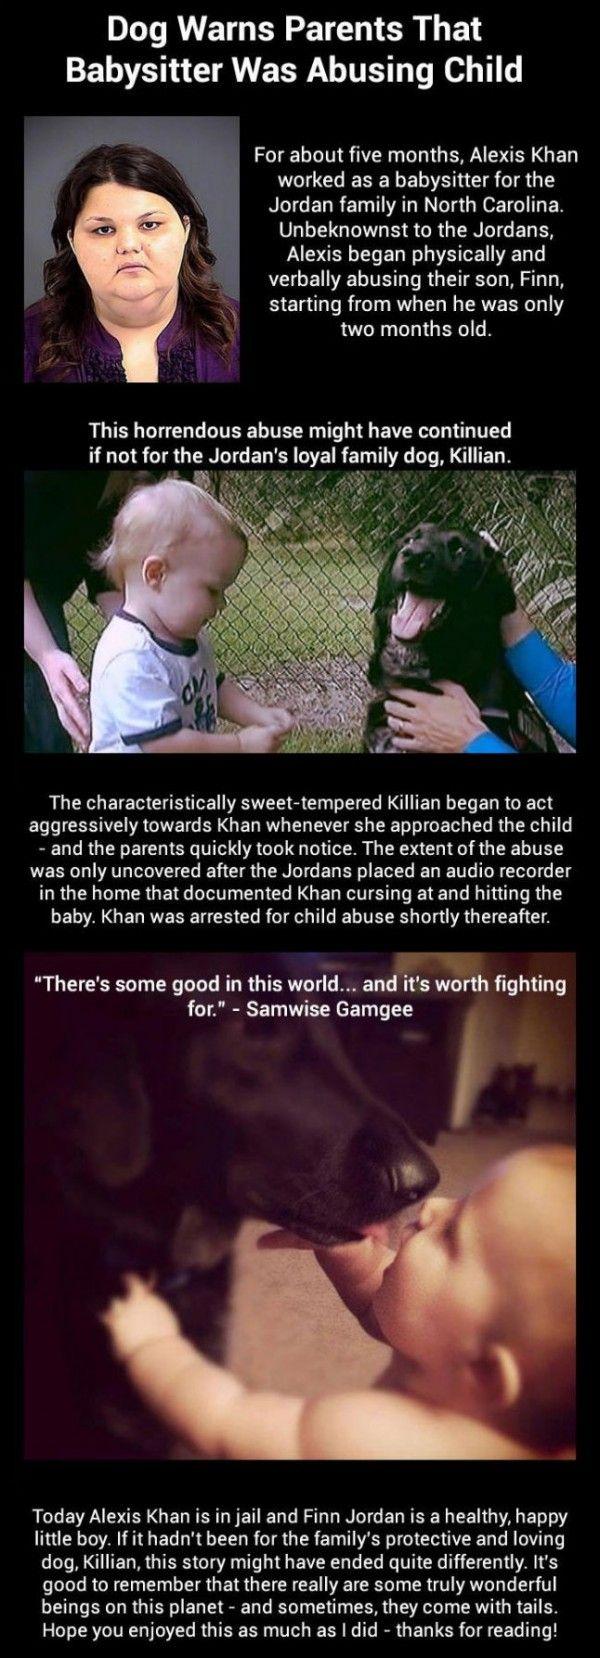 Dog Warns Parents Babysitter Was Abusing Child - http://www.jokideo.com/dog-warns-parents-babysitter-abusing-child/